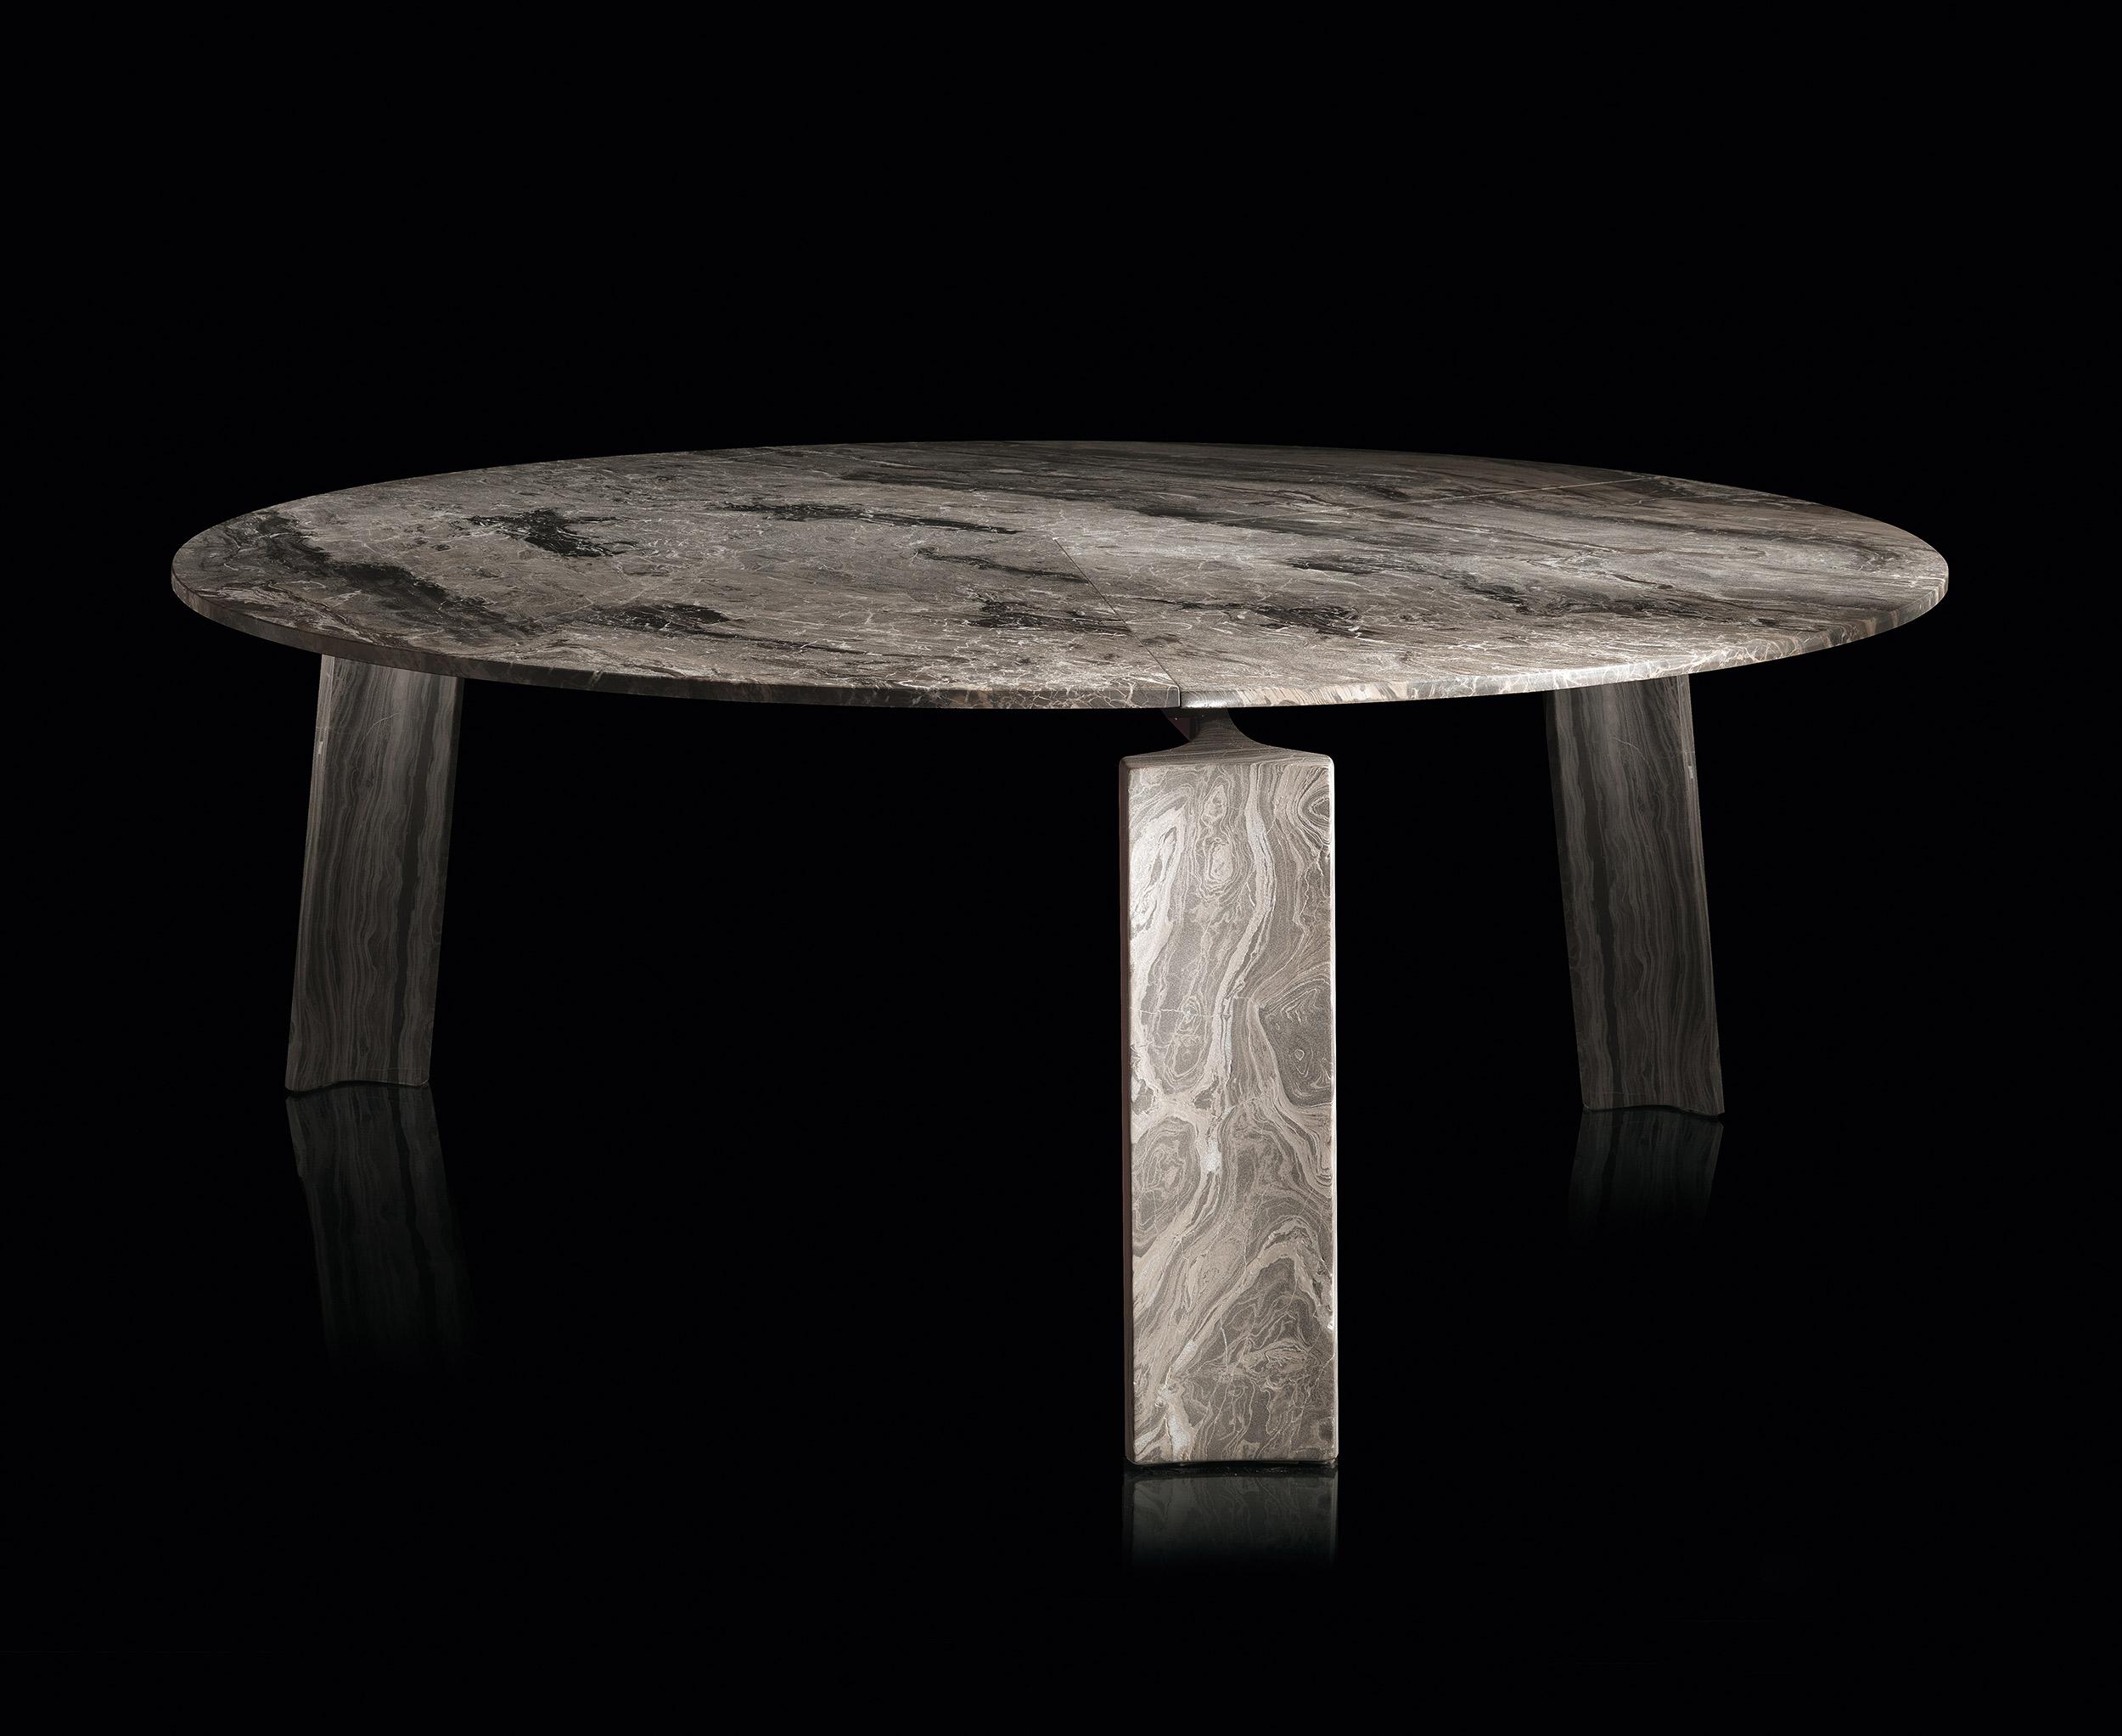 STONE | Henge, stone table - David Shaw View 1